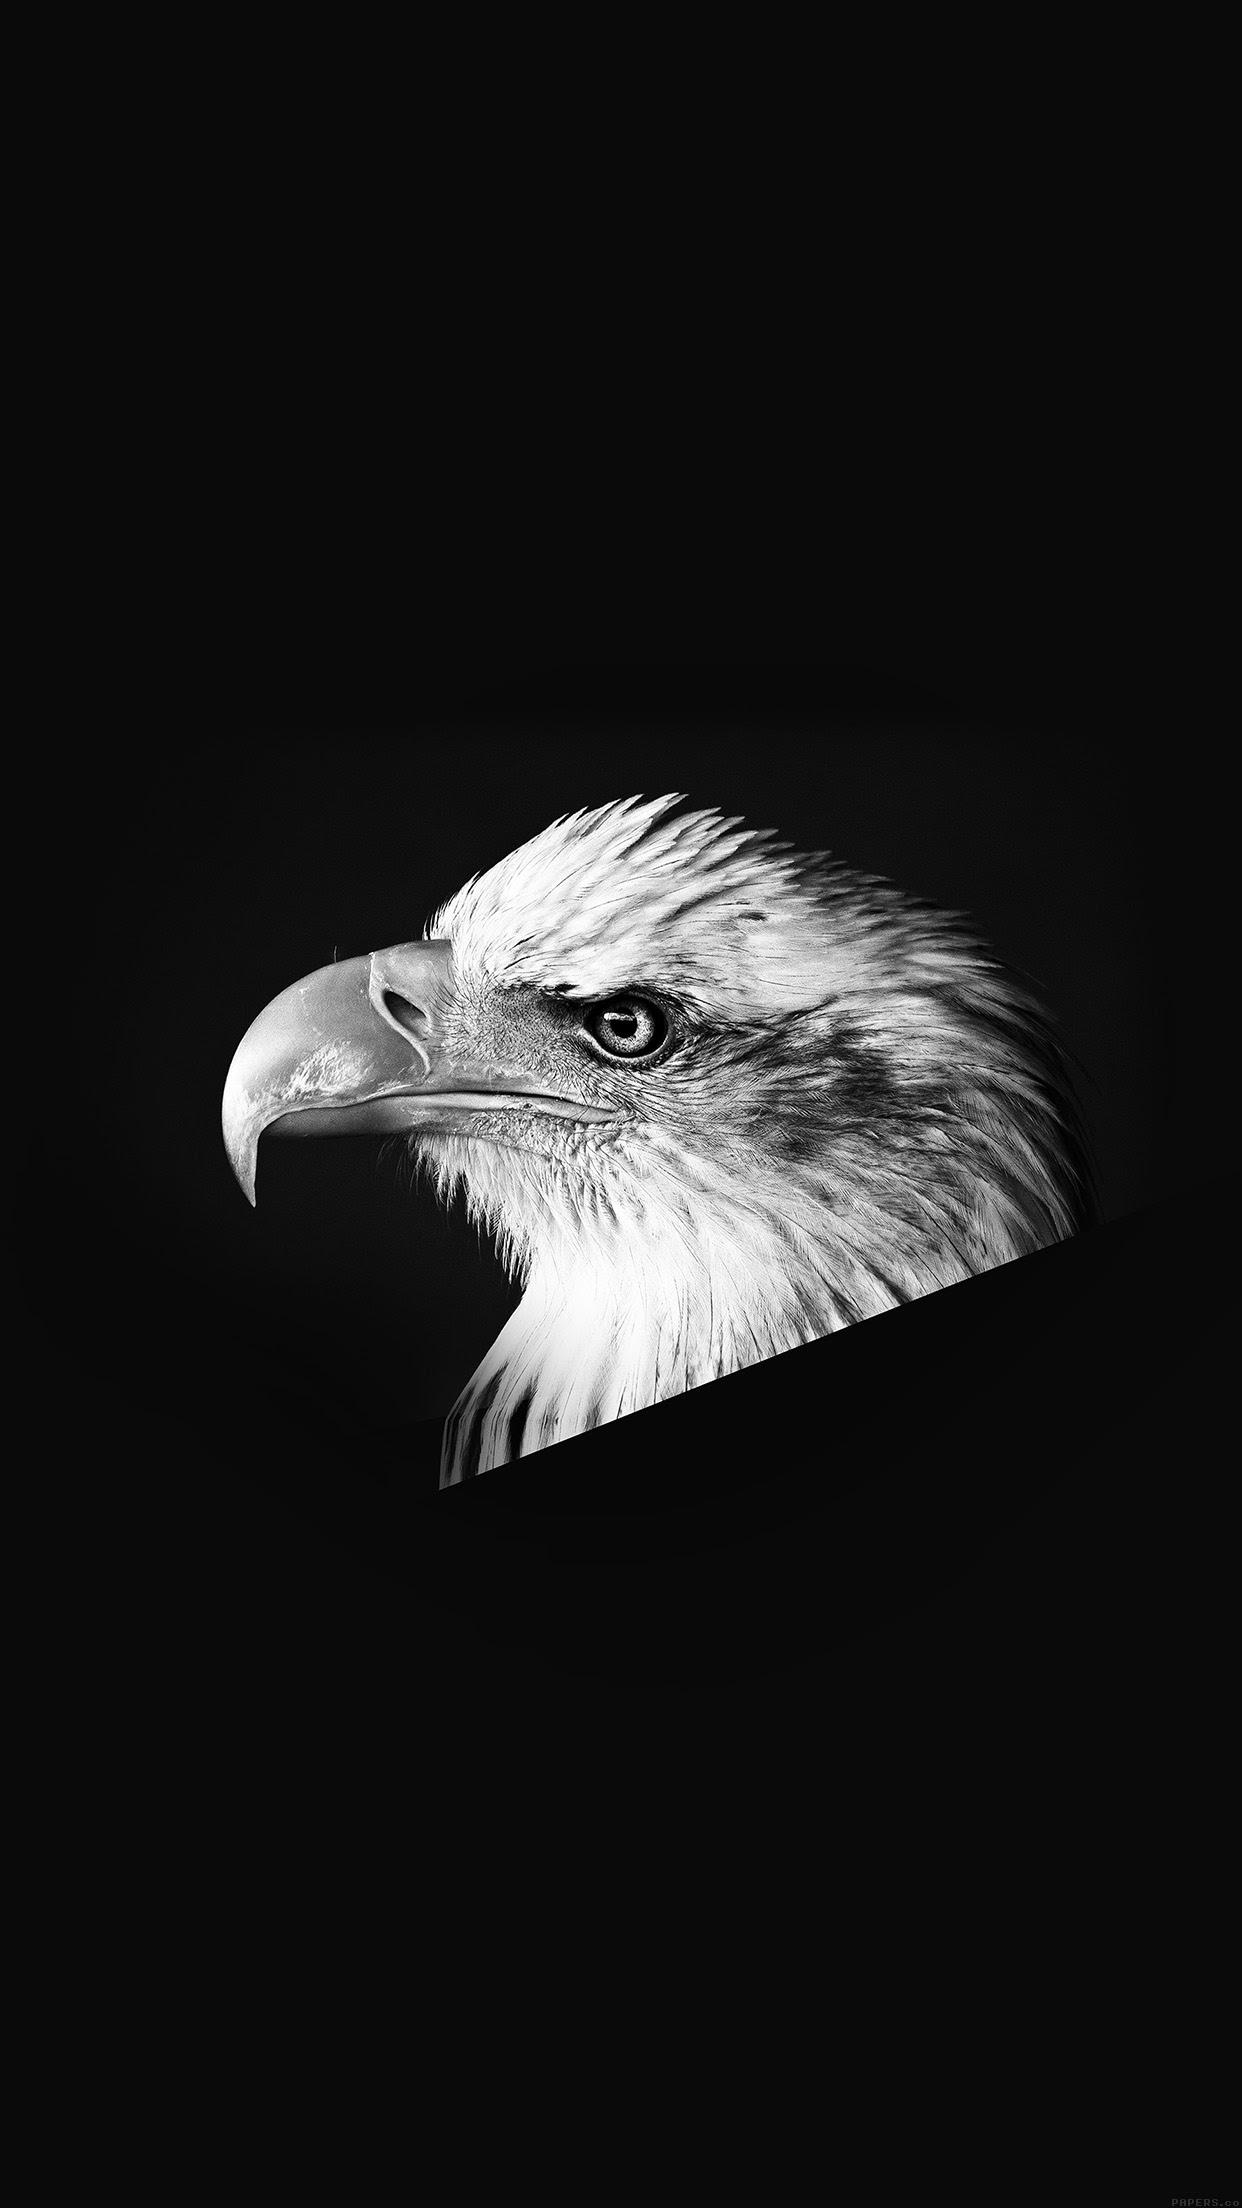 800 Wallpaper Black Eagle